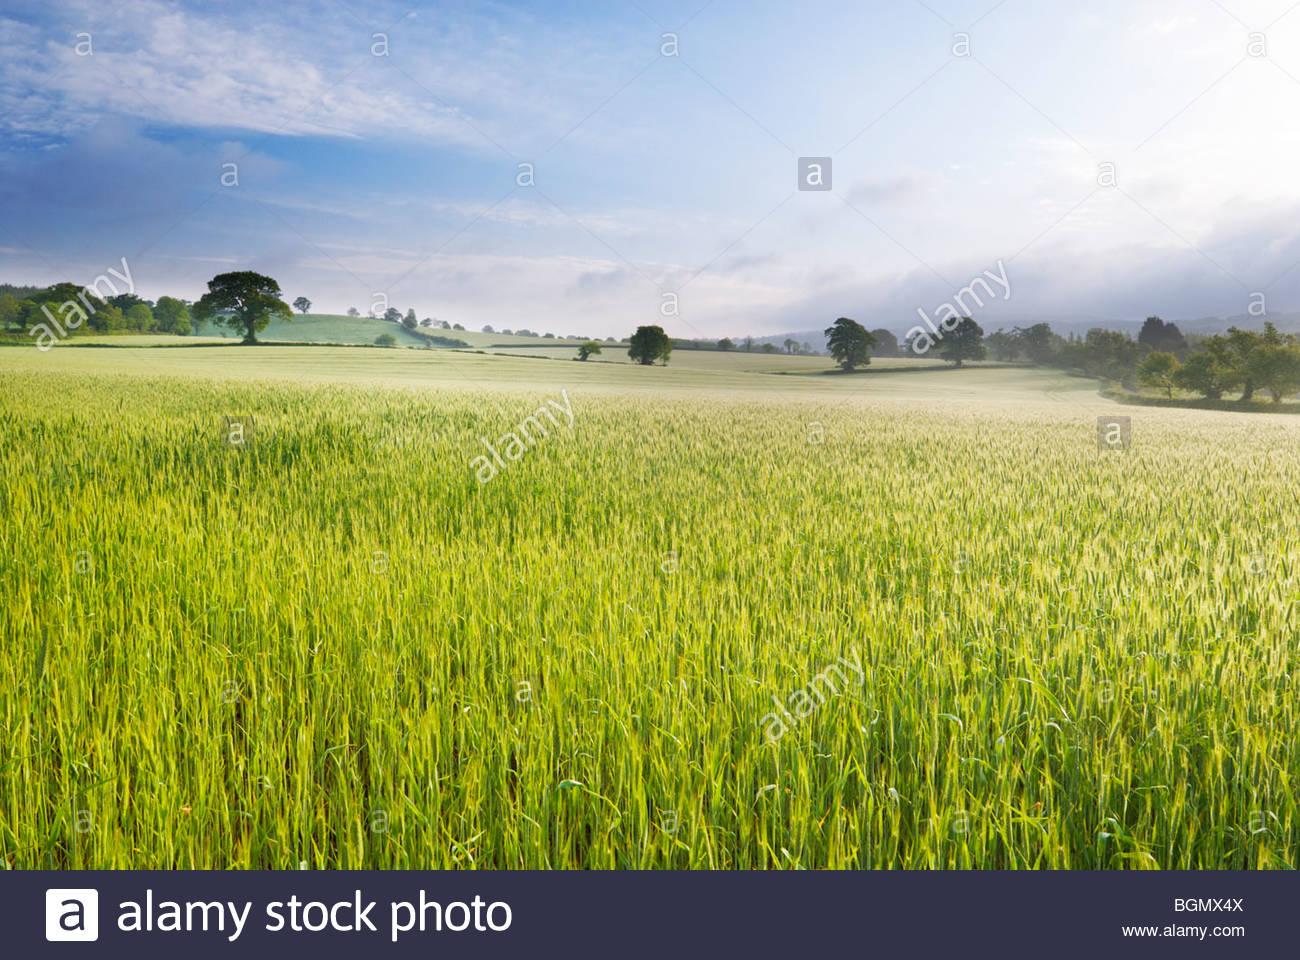 Wheat field, near Budleigh Salterton, East Devon, England. - Stock Image